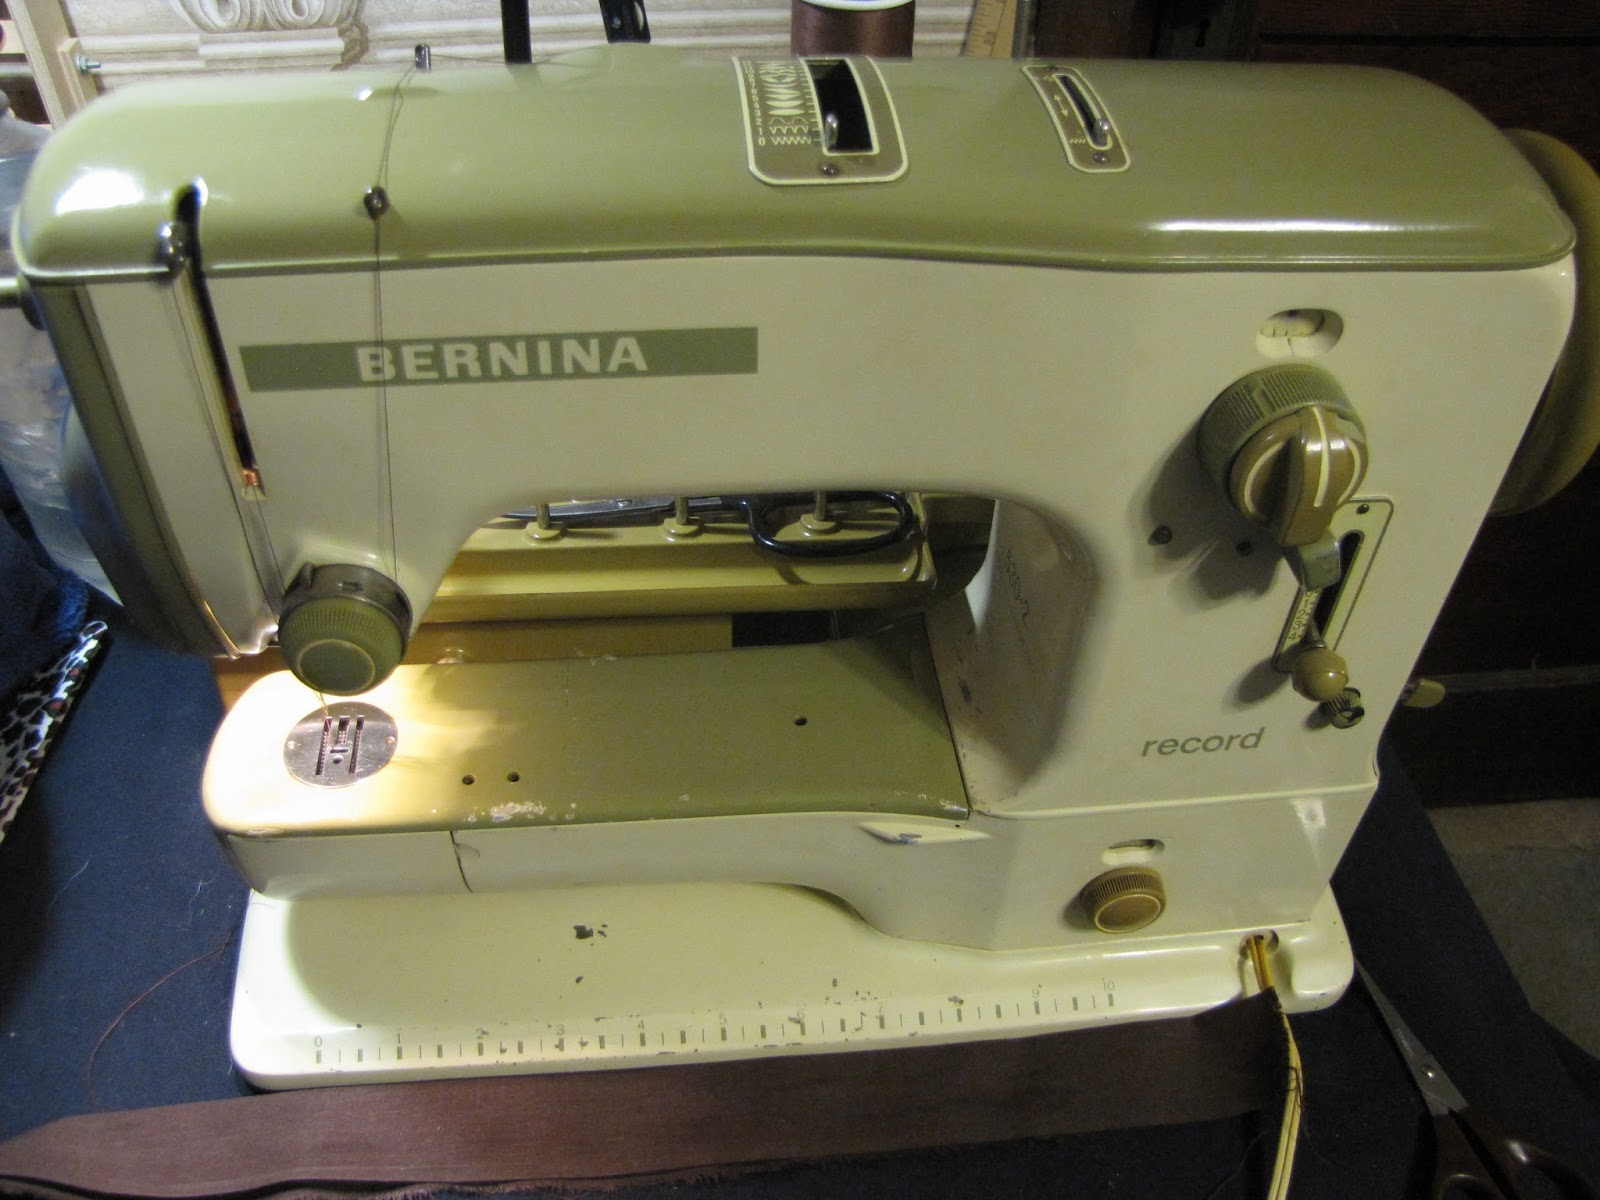 medium resolution of vintage sewing machines bernina sewing machine jpg 1600x1200 used bernina sewing machines sale